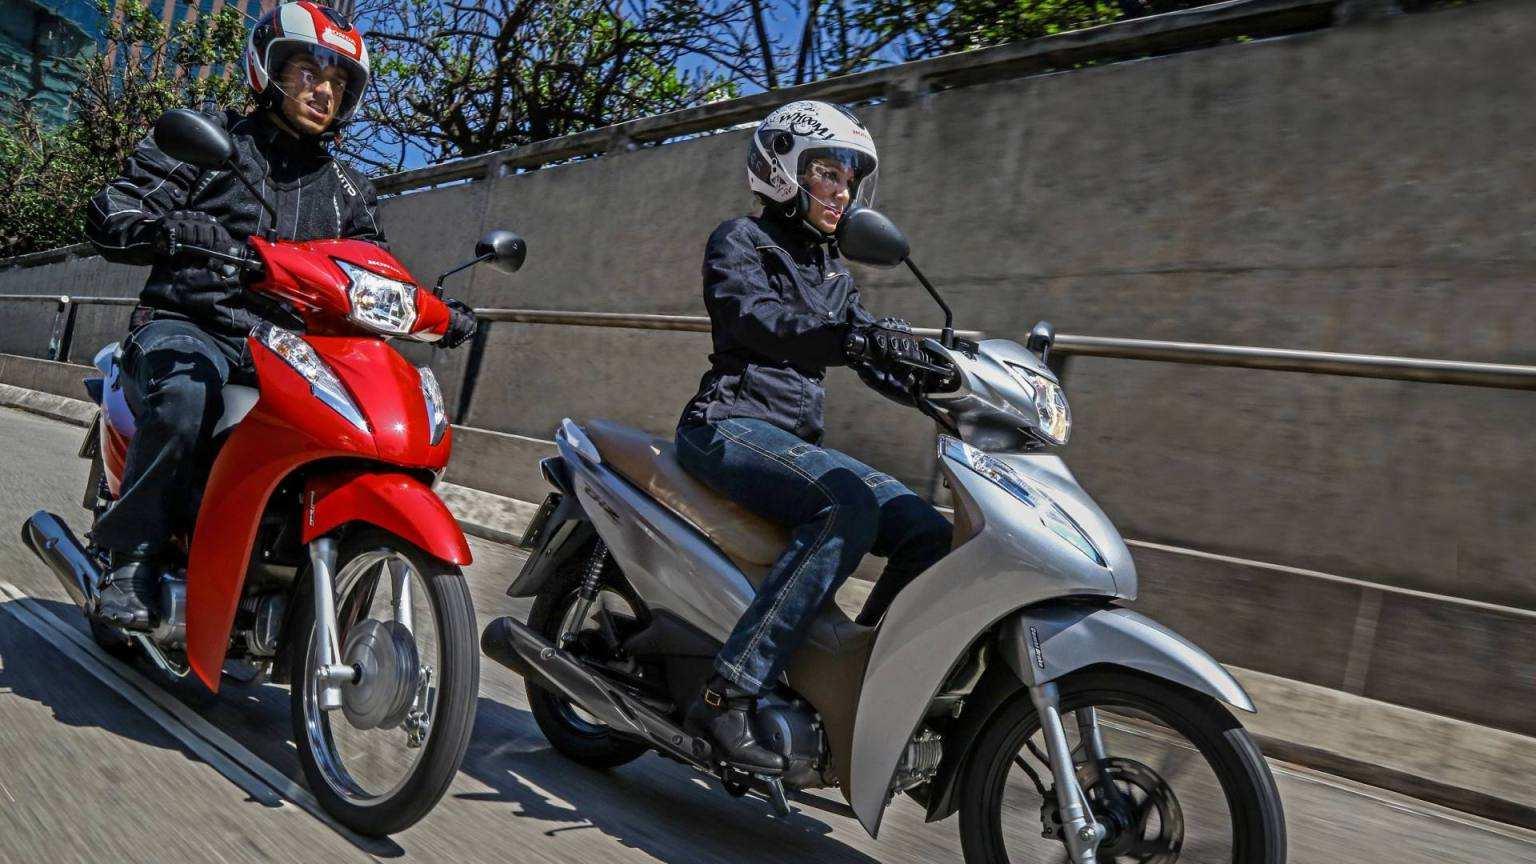 18 Best Review Honda Biz 2019 Pricing with Honda Biz 2019